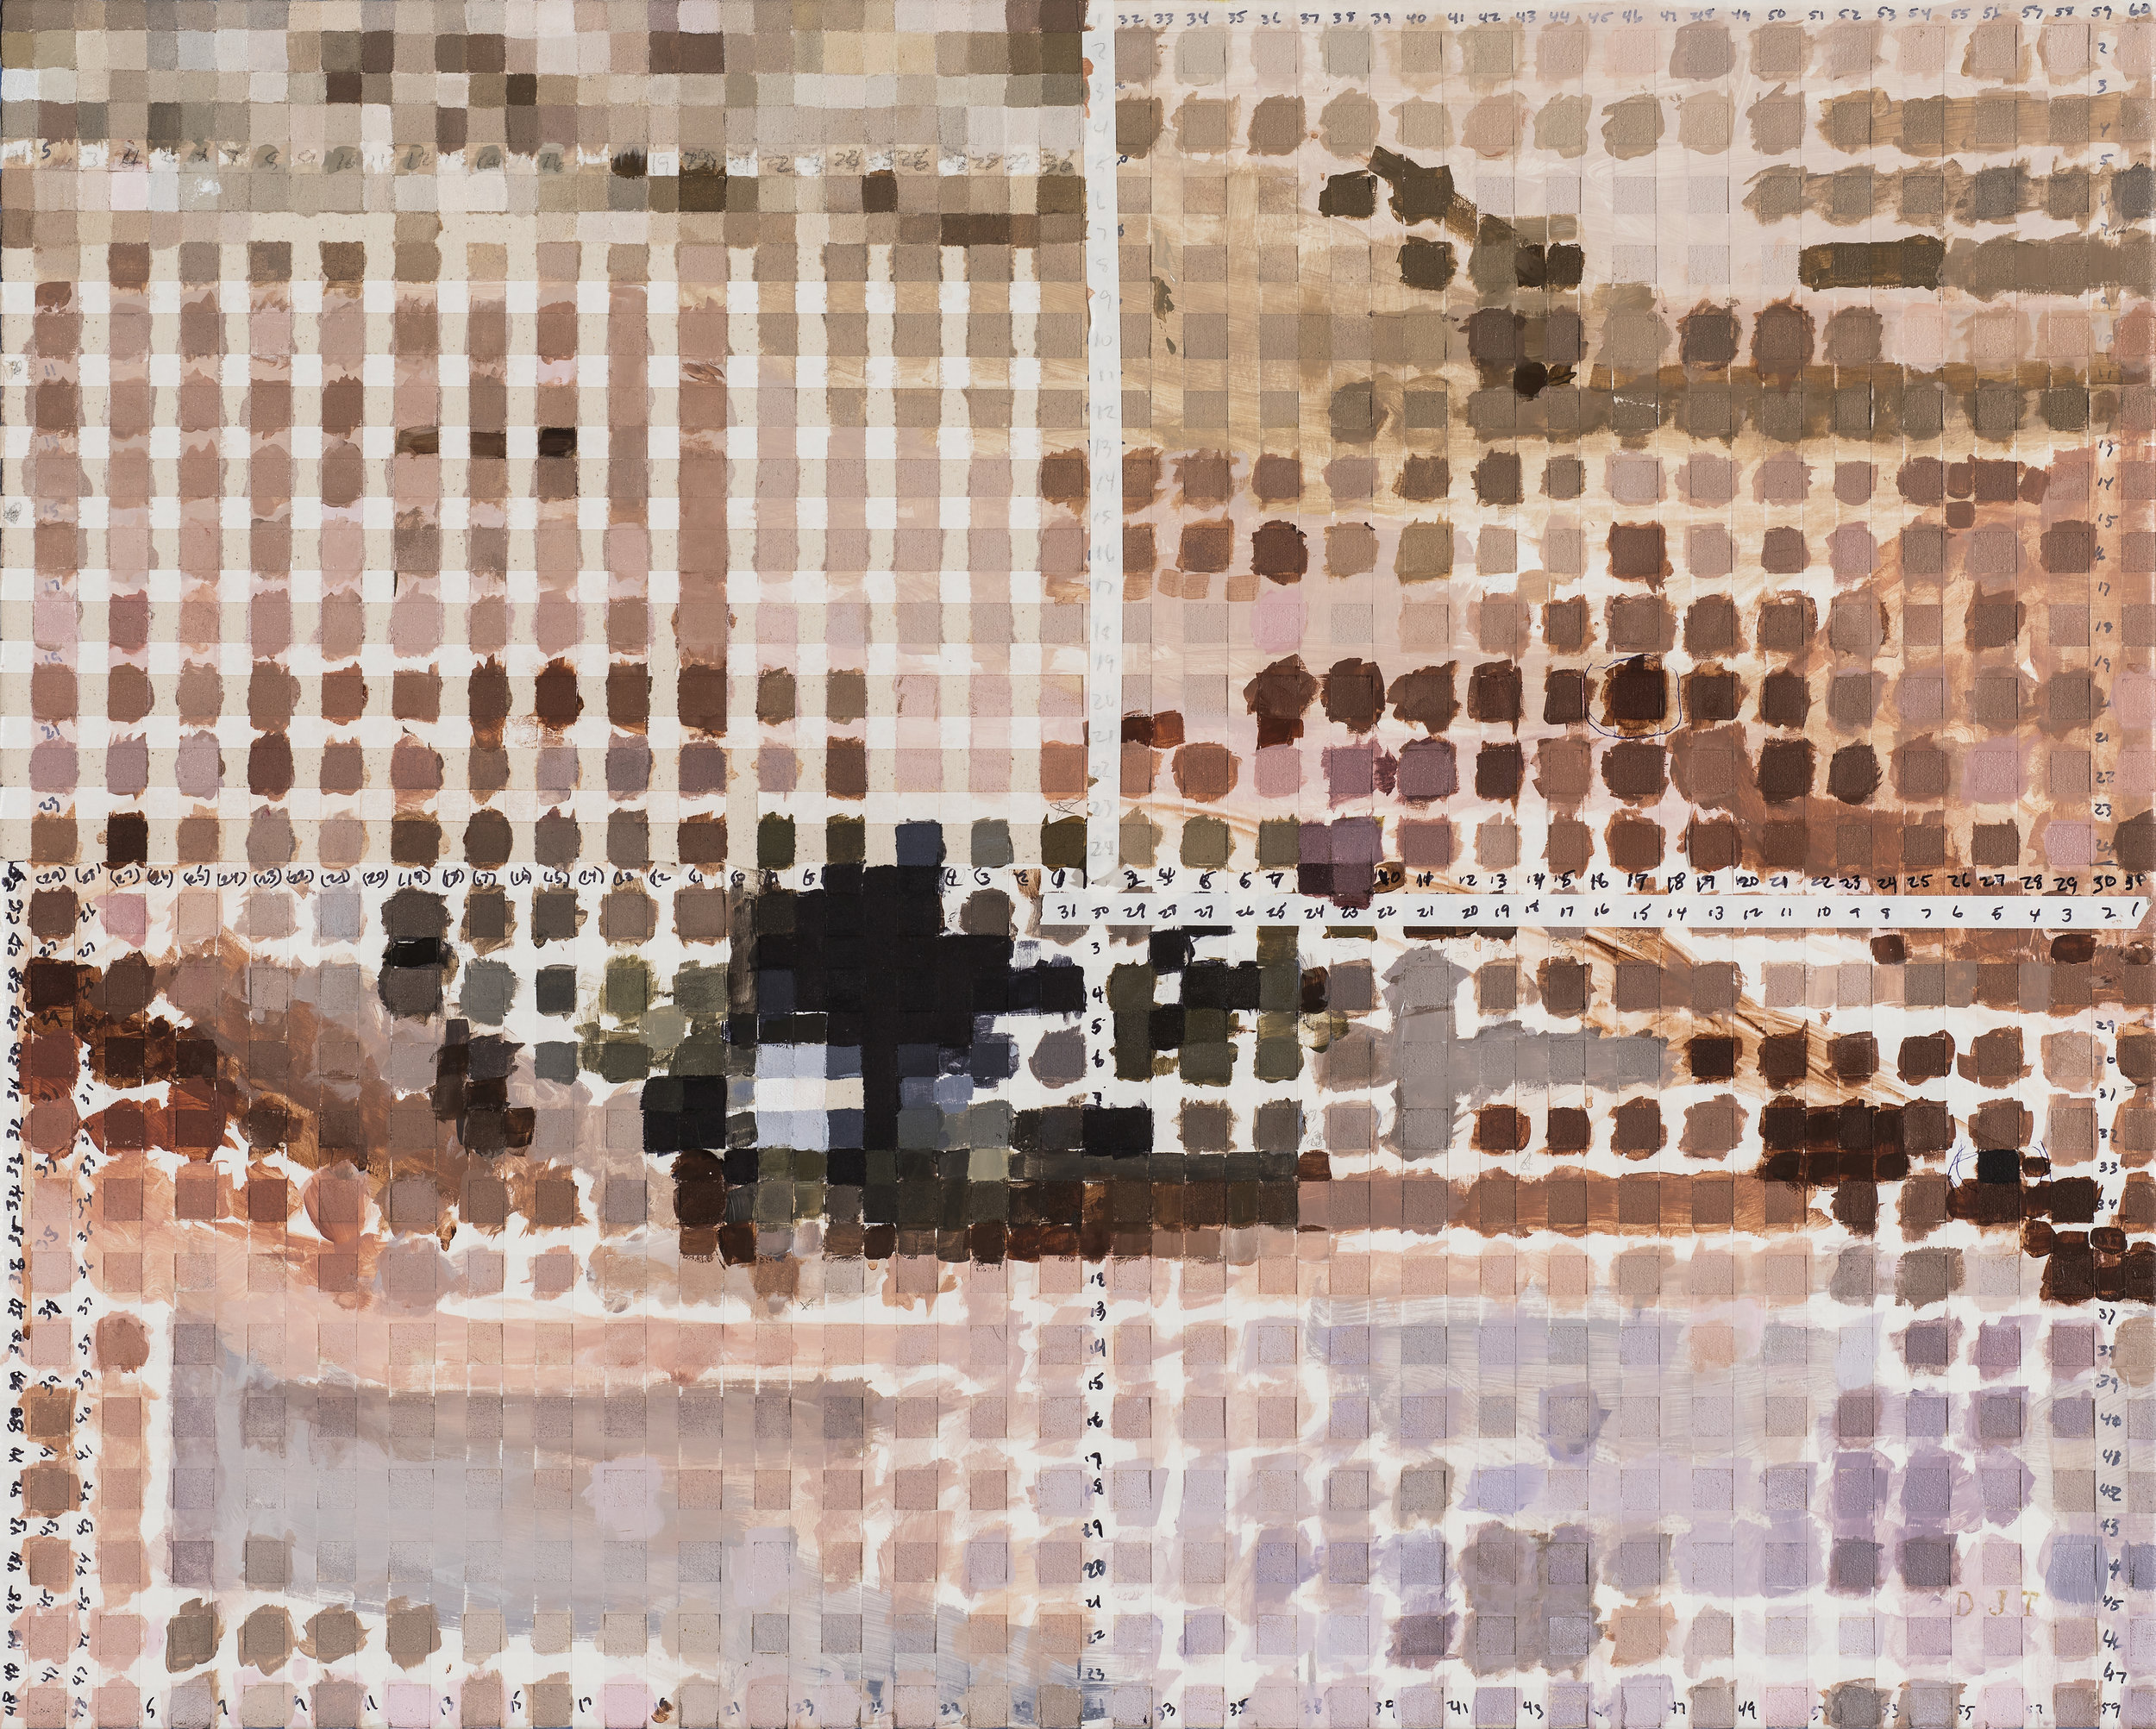 "Kathy Varadi, Self Poor Trait, 2017, Acrylic and tape on canvas, 24"" x 30"" on exhibit"